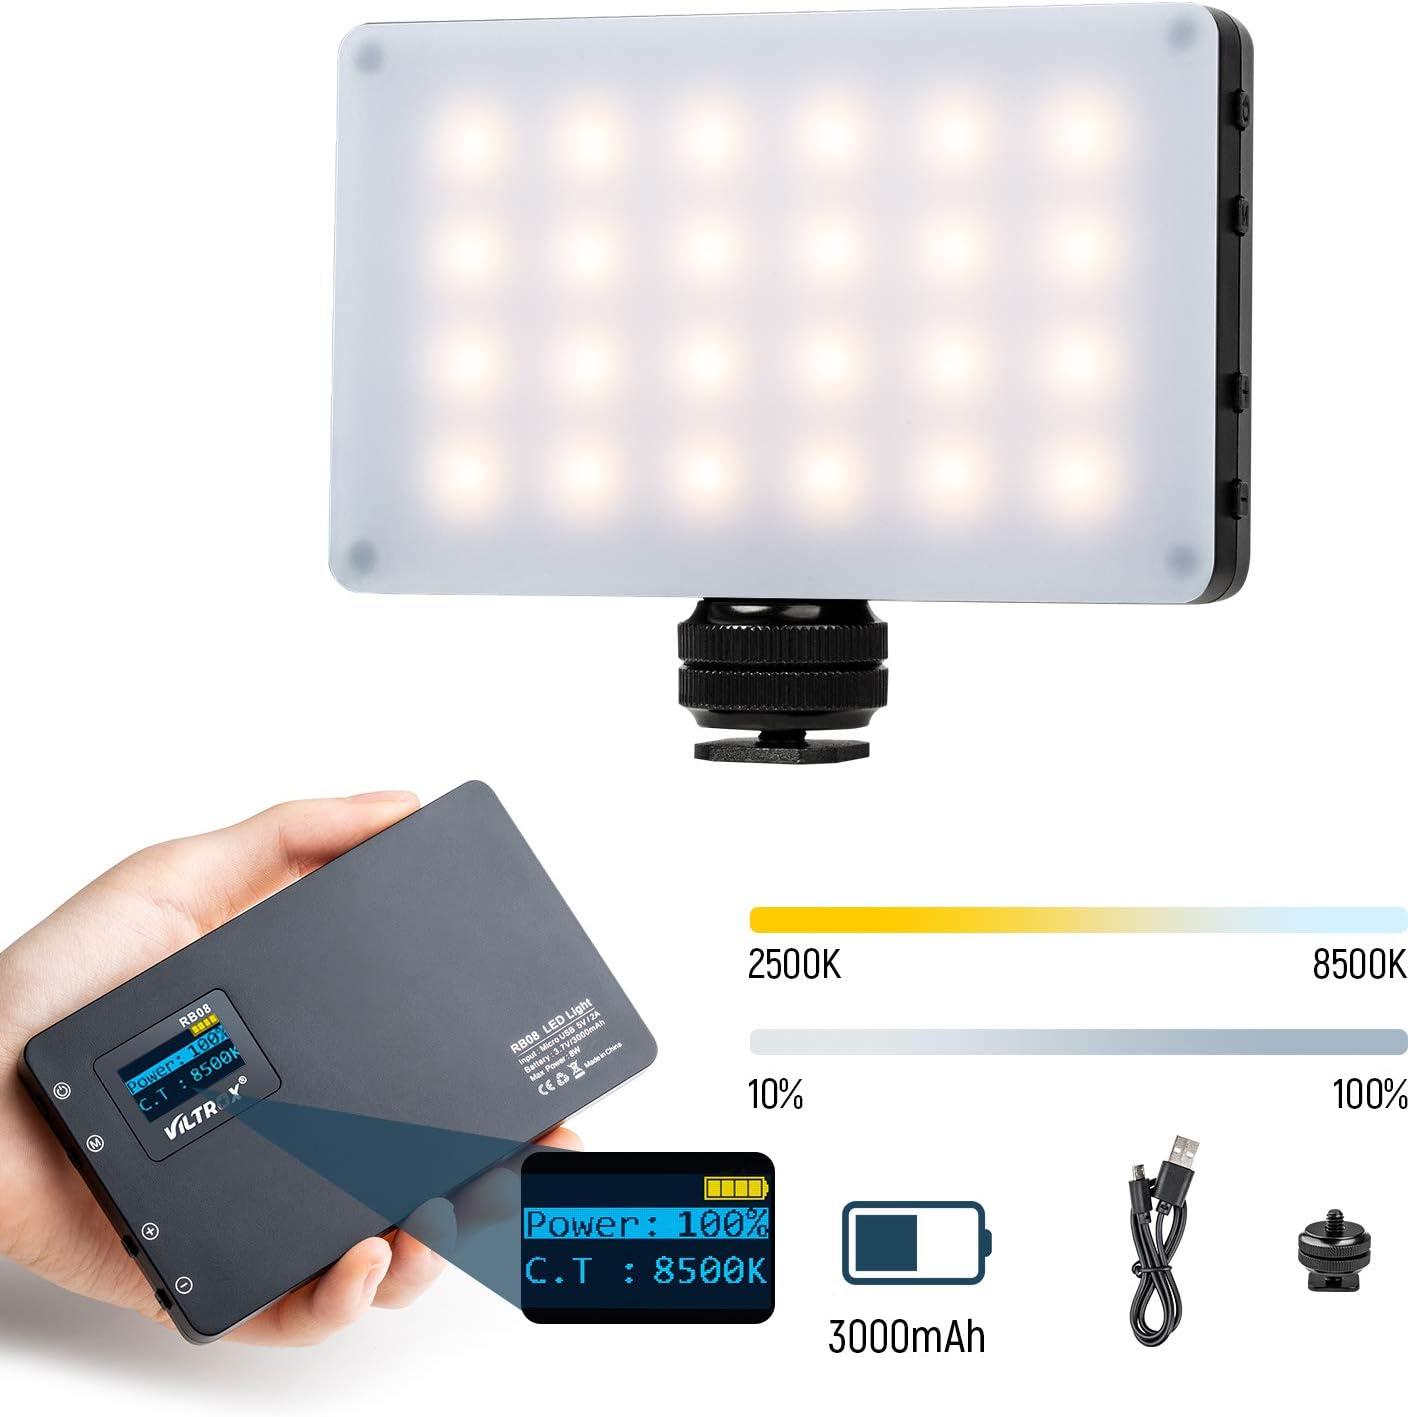 Pocket On-Camera Video Fill Light 2500K~8500K for DSLR Camera Camcorder with 3000mAh Battery CRI 95 Magnet Filters Mini LED Light